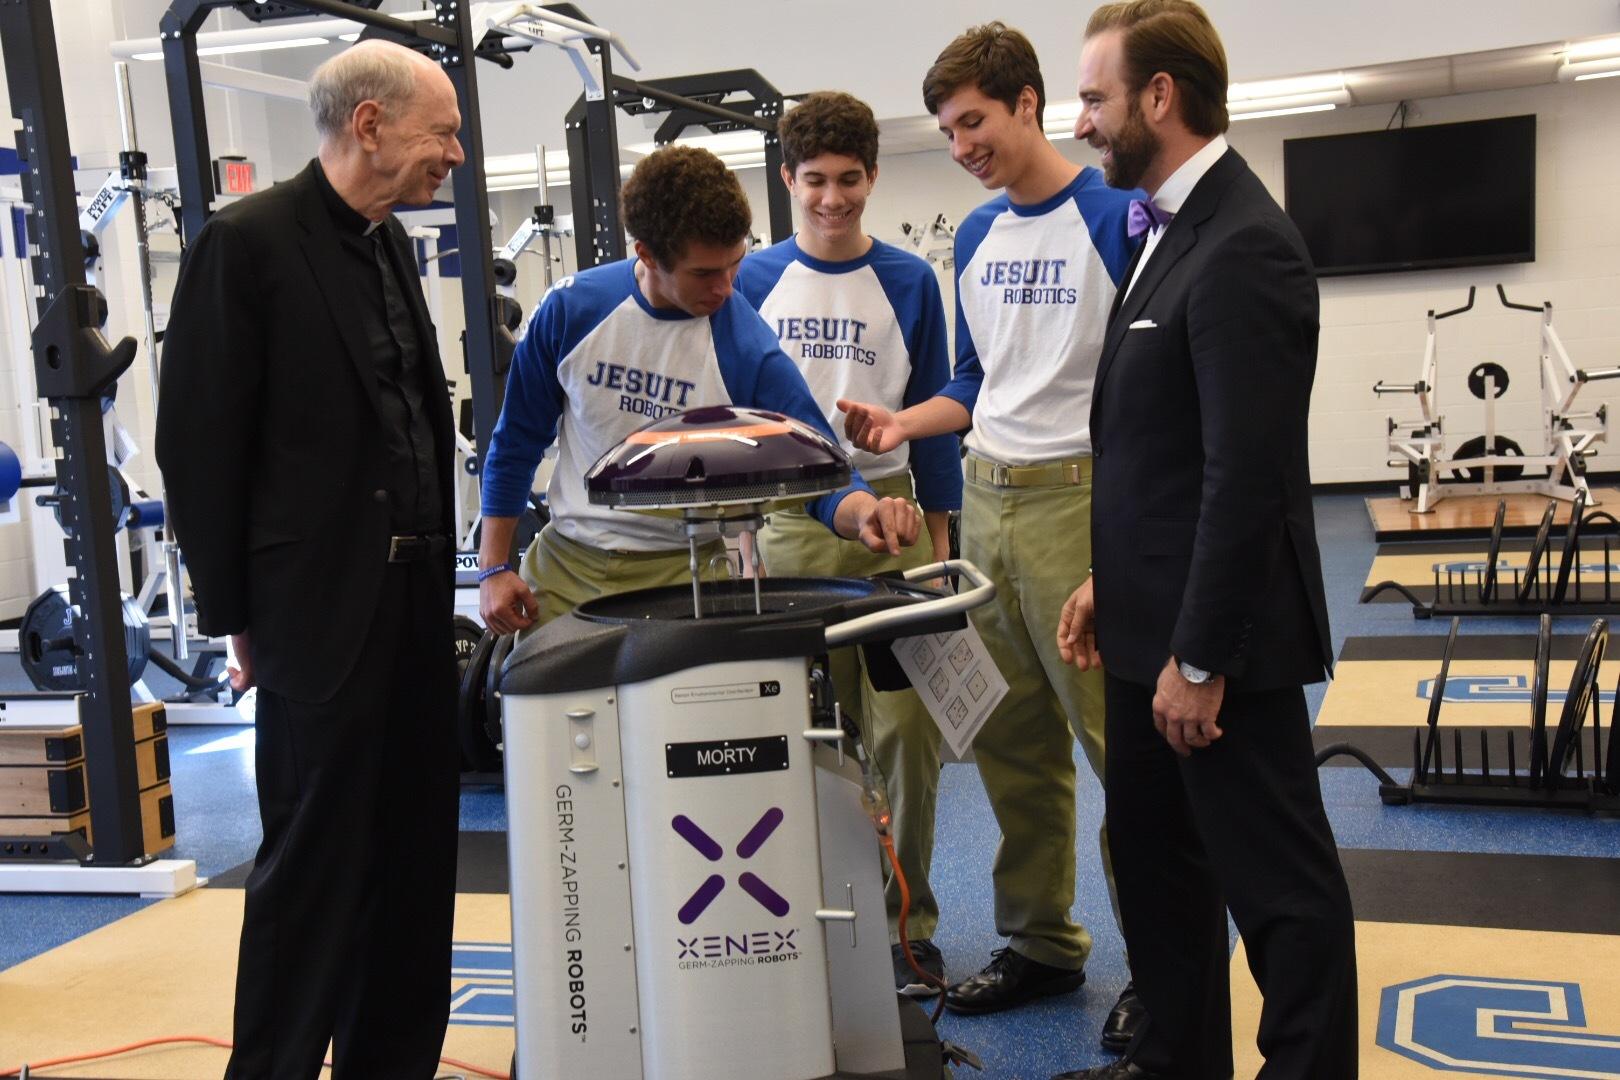 Jesuit High School Alumnus Donates Xenex Germ Zapping Robot To His